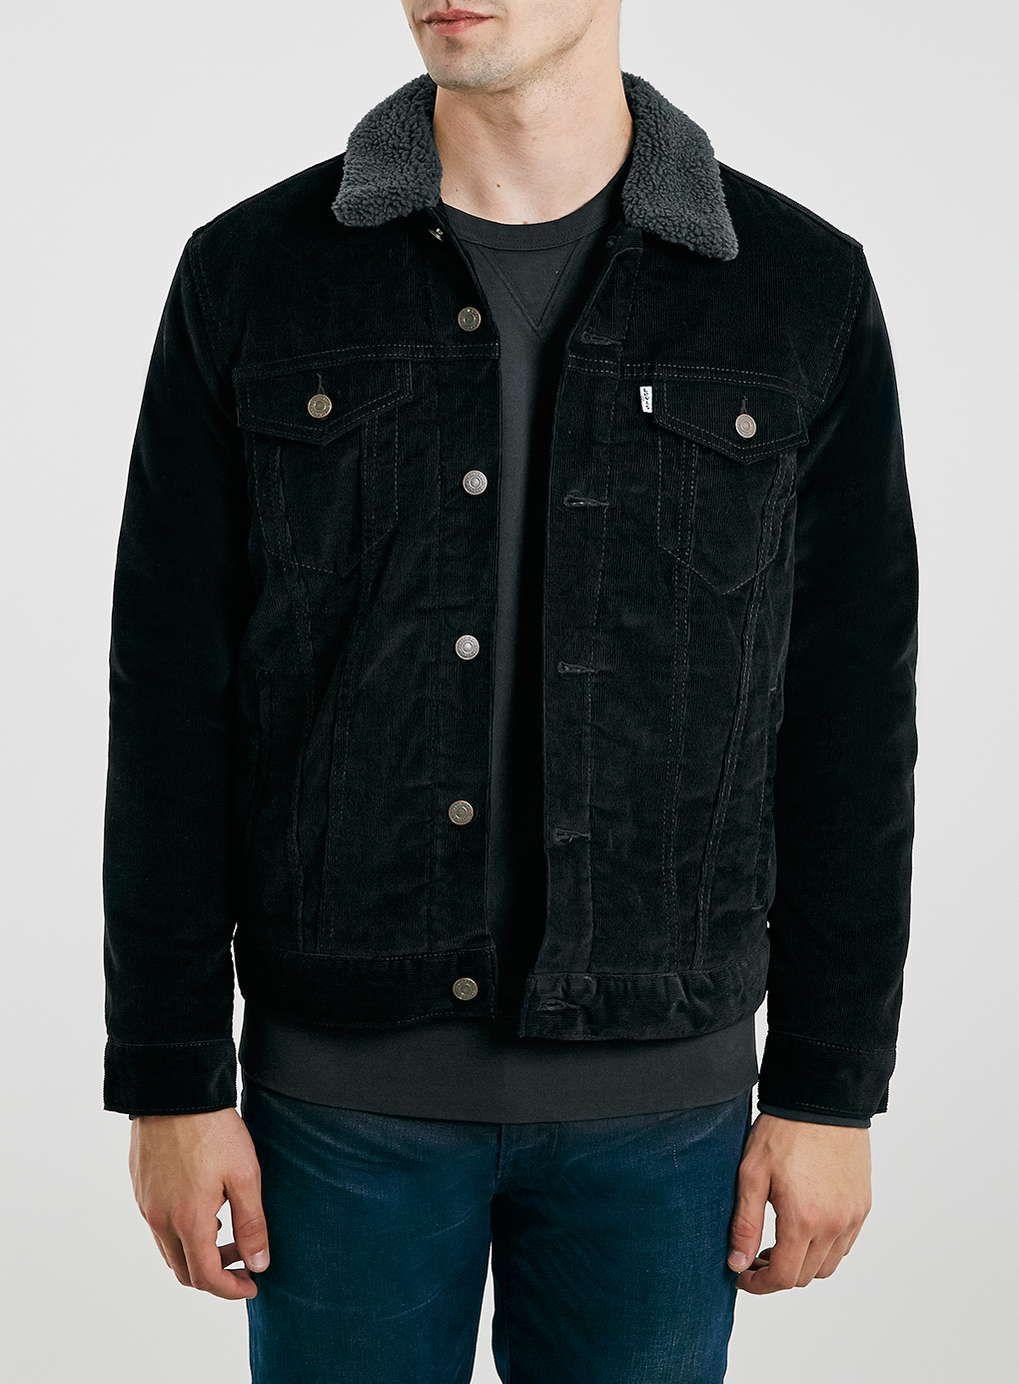 Levi's Black Sherpa Jacket* - Men's Coats & Jackets - Clothing | Black